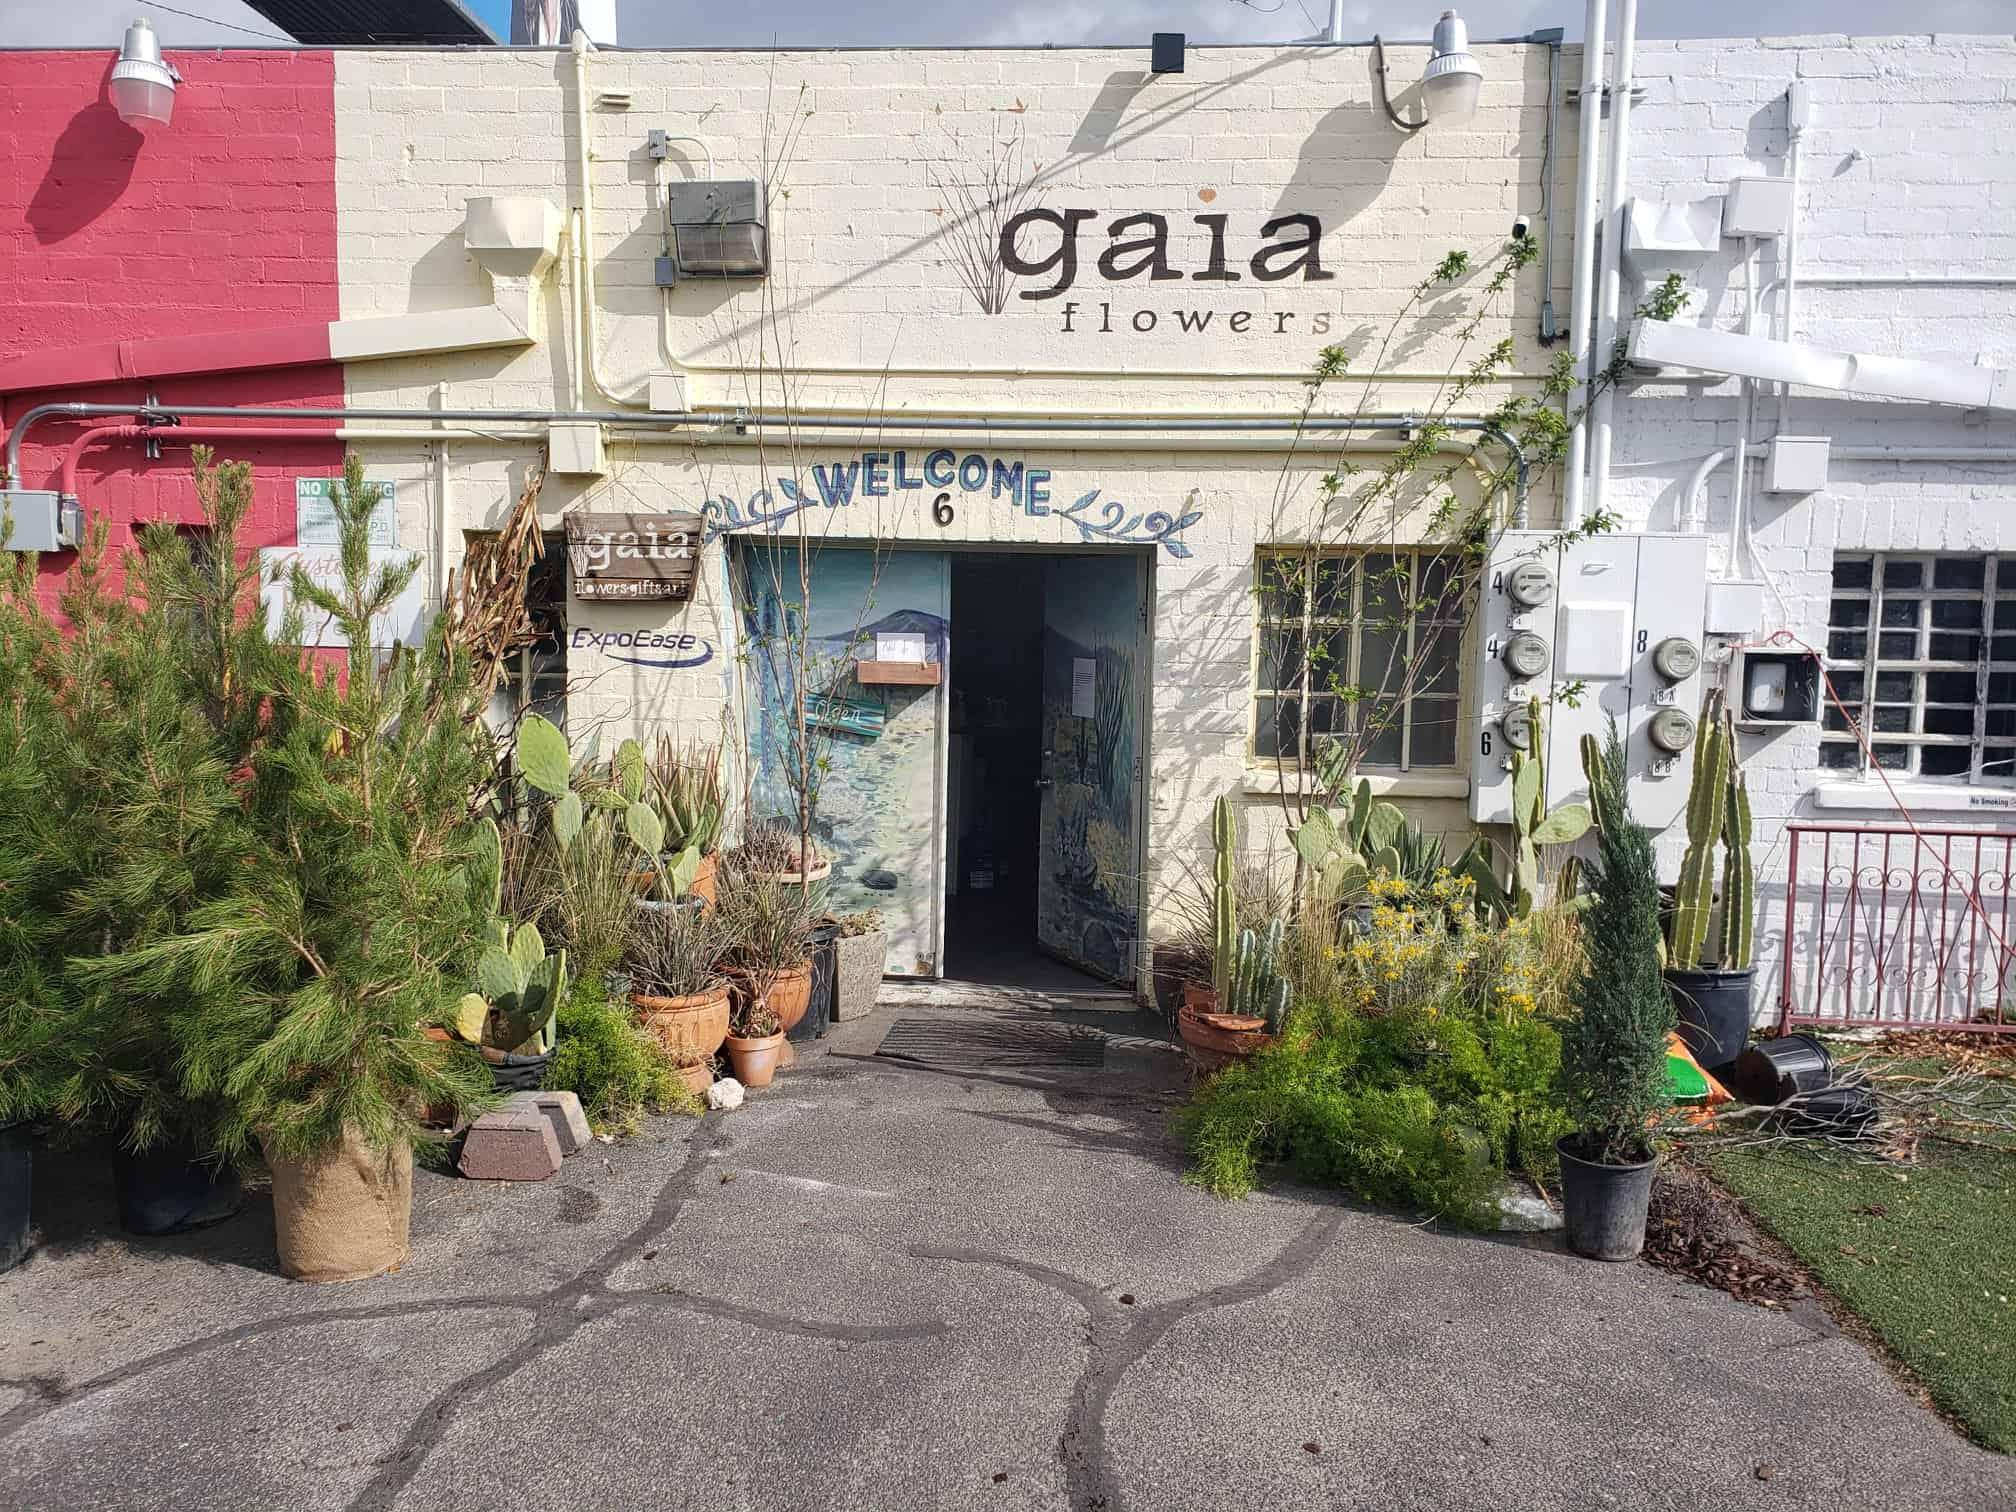 Florist storefront surrounded by plants in Las Vegas Arts District